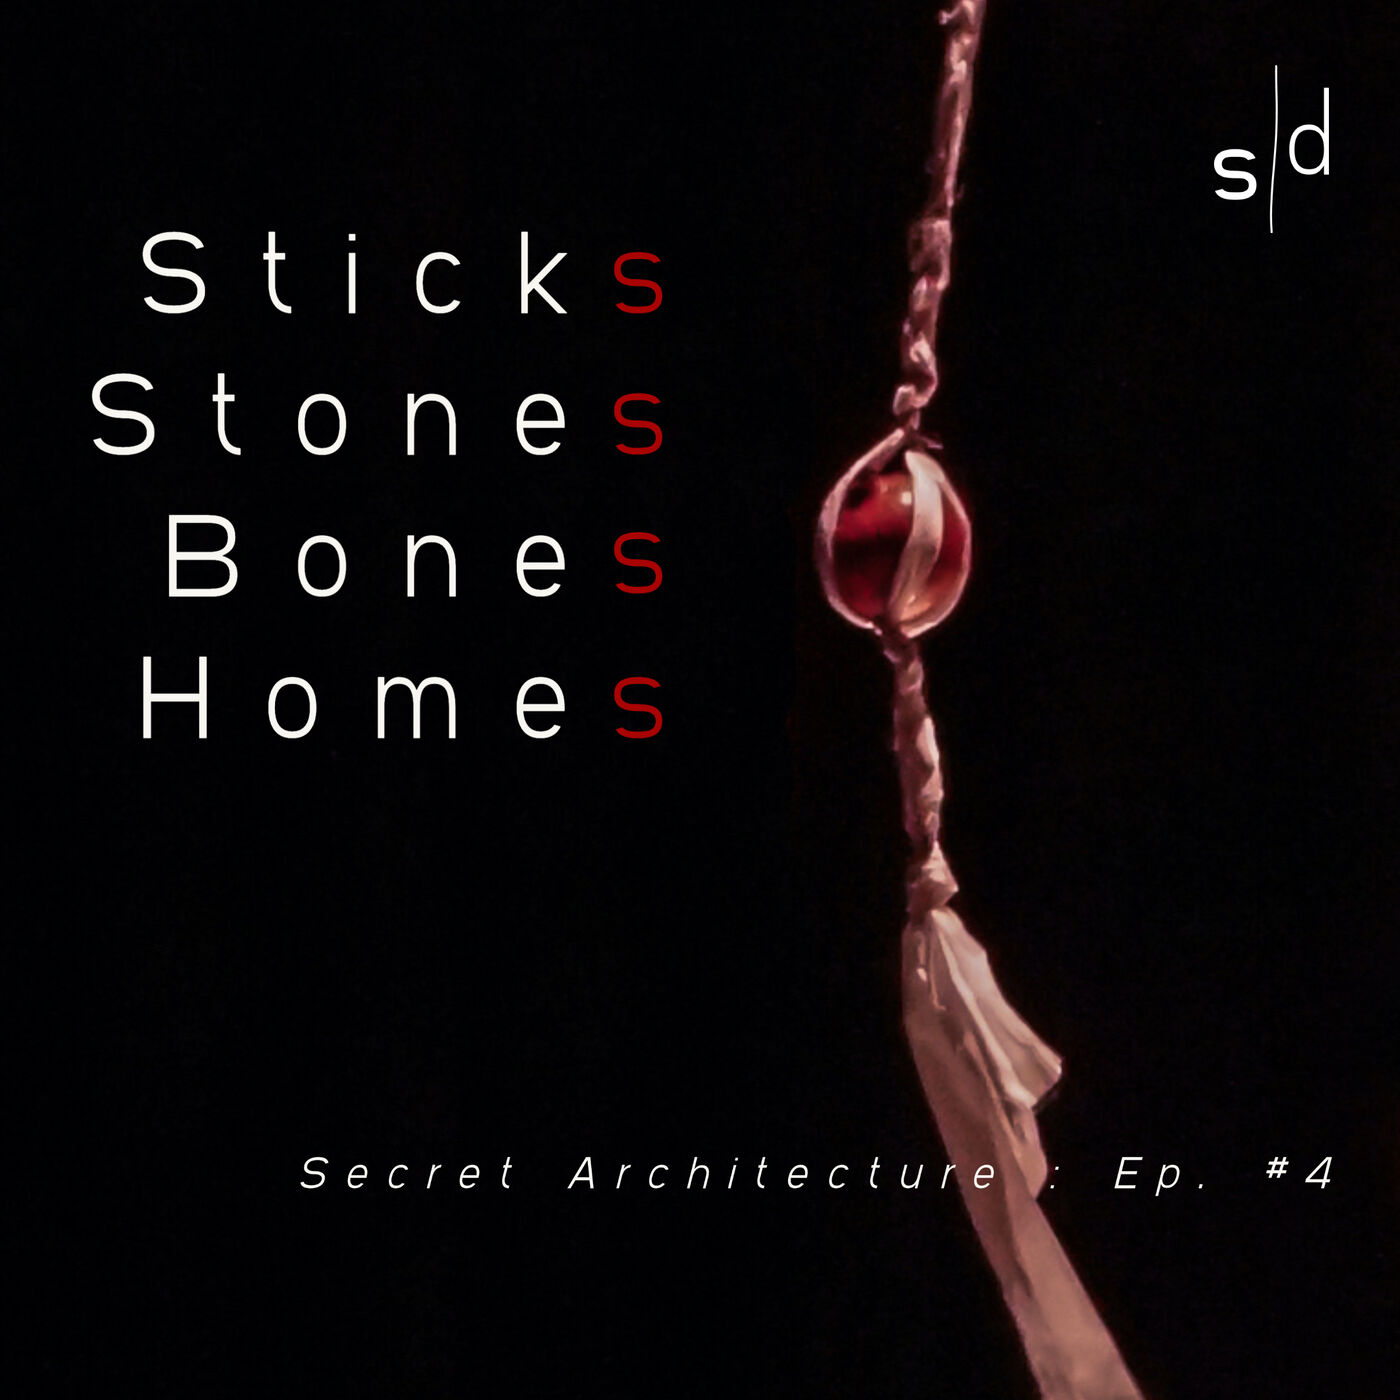 Sticks Stones Bones Homes